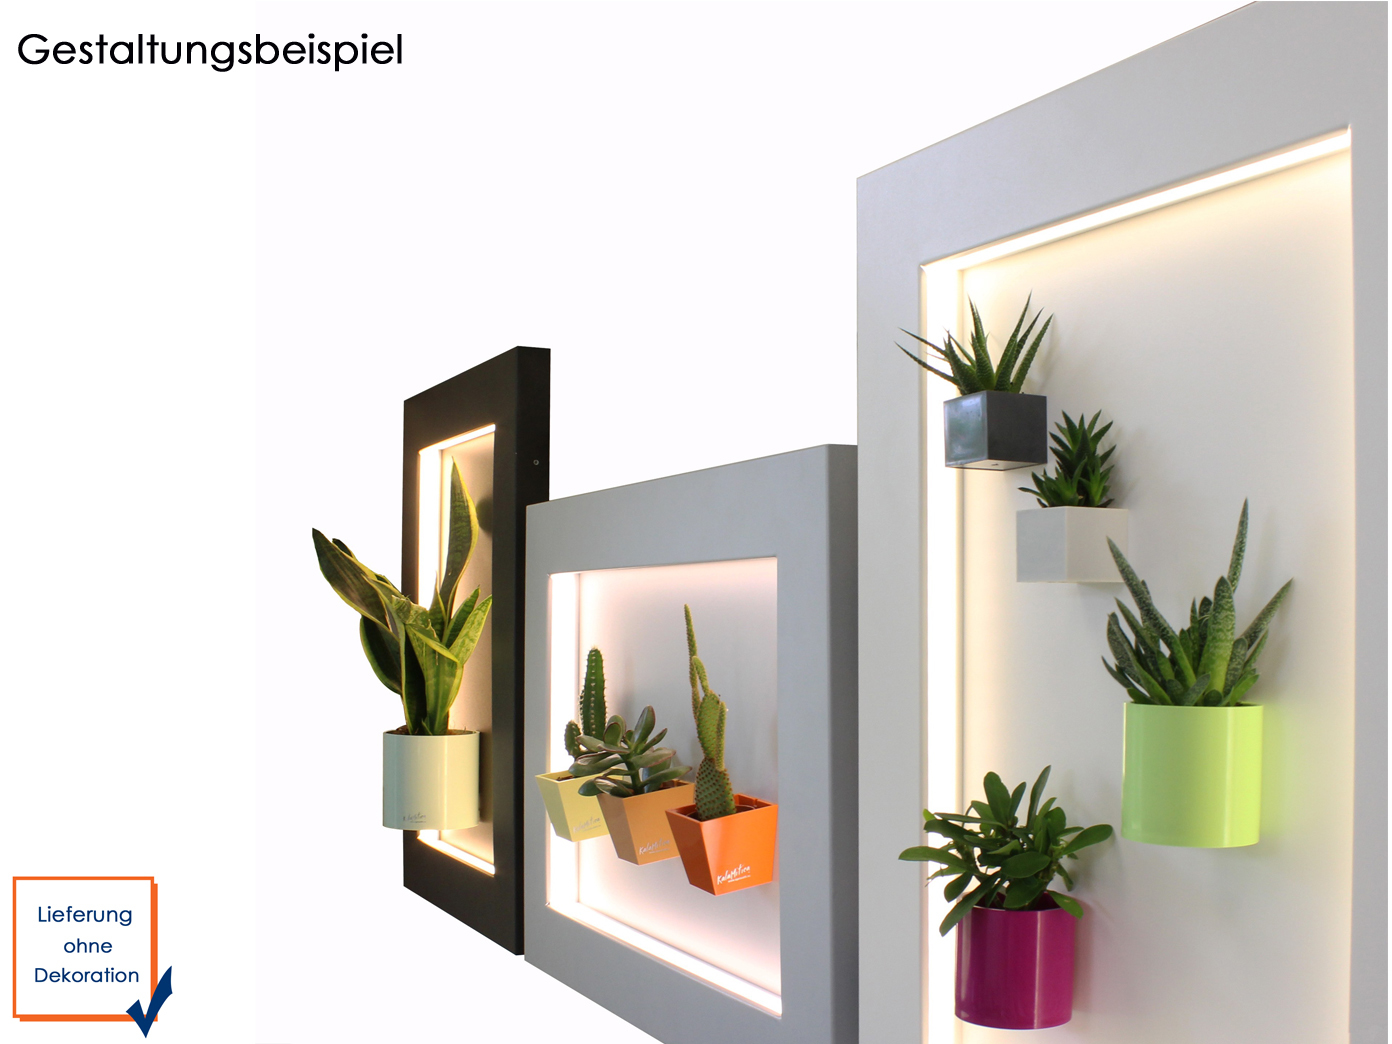 wanddeko magnettafel aus metall mit led beleuchtung 47 5 x 64 5 cm kalamitica ebay. Black Bedroom Furniture Sets. Home Design Ideas